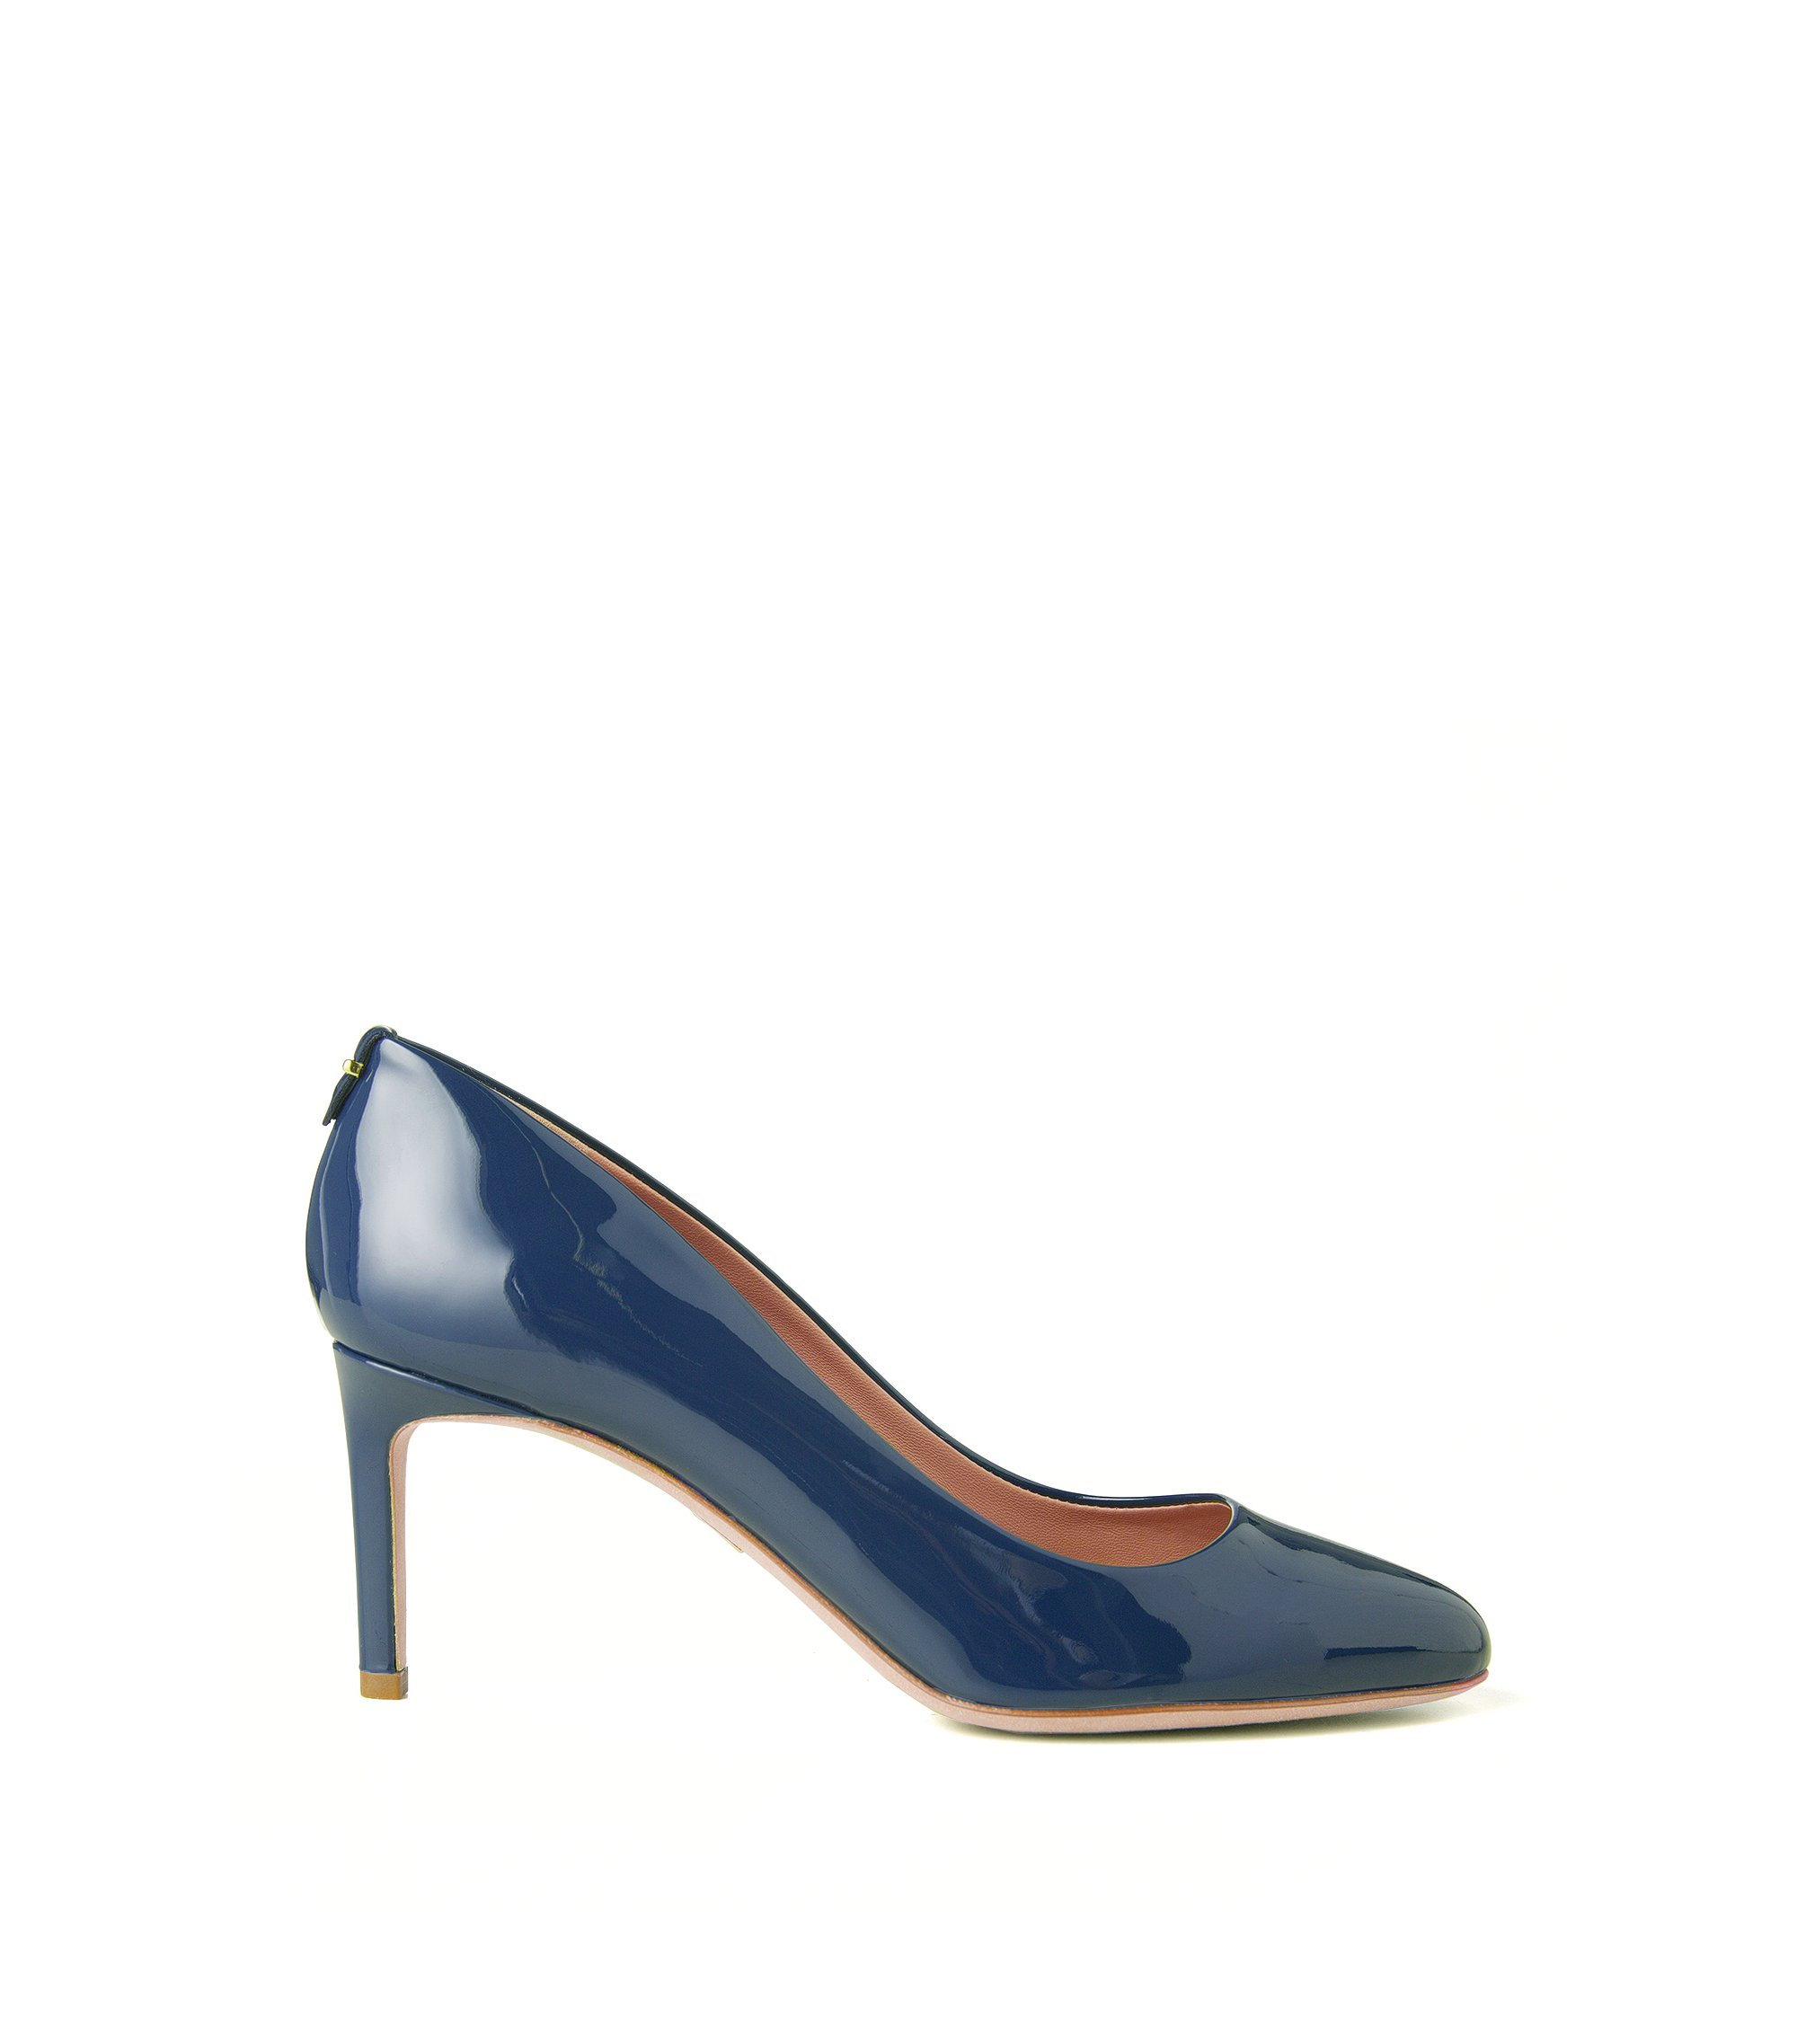 BOSS Luxury Staple pumps in Italian patent leather , Dark Blue